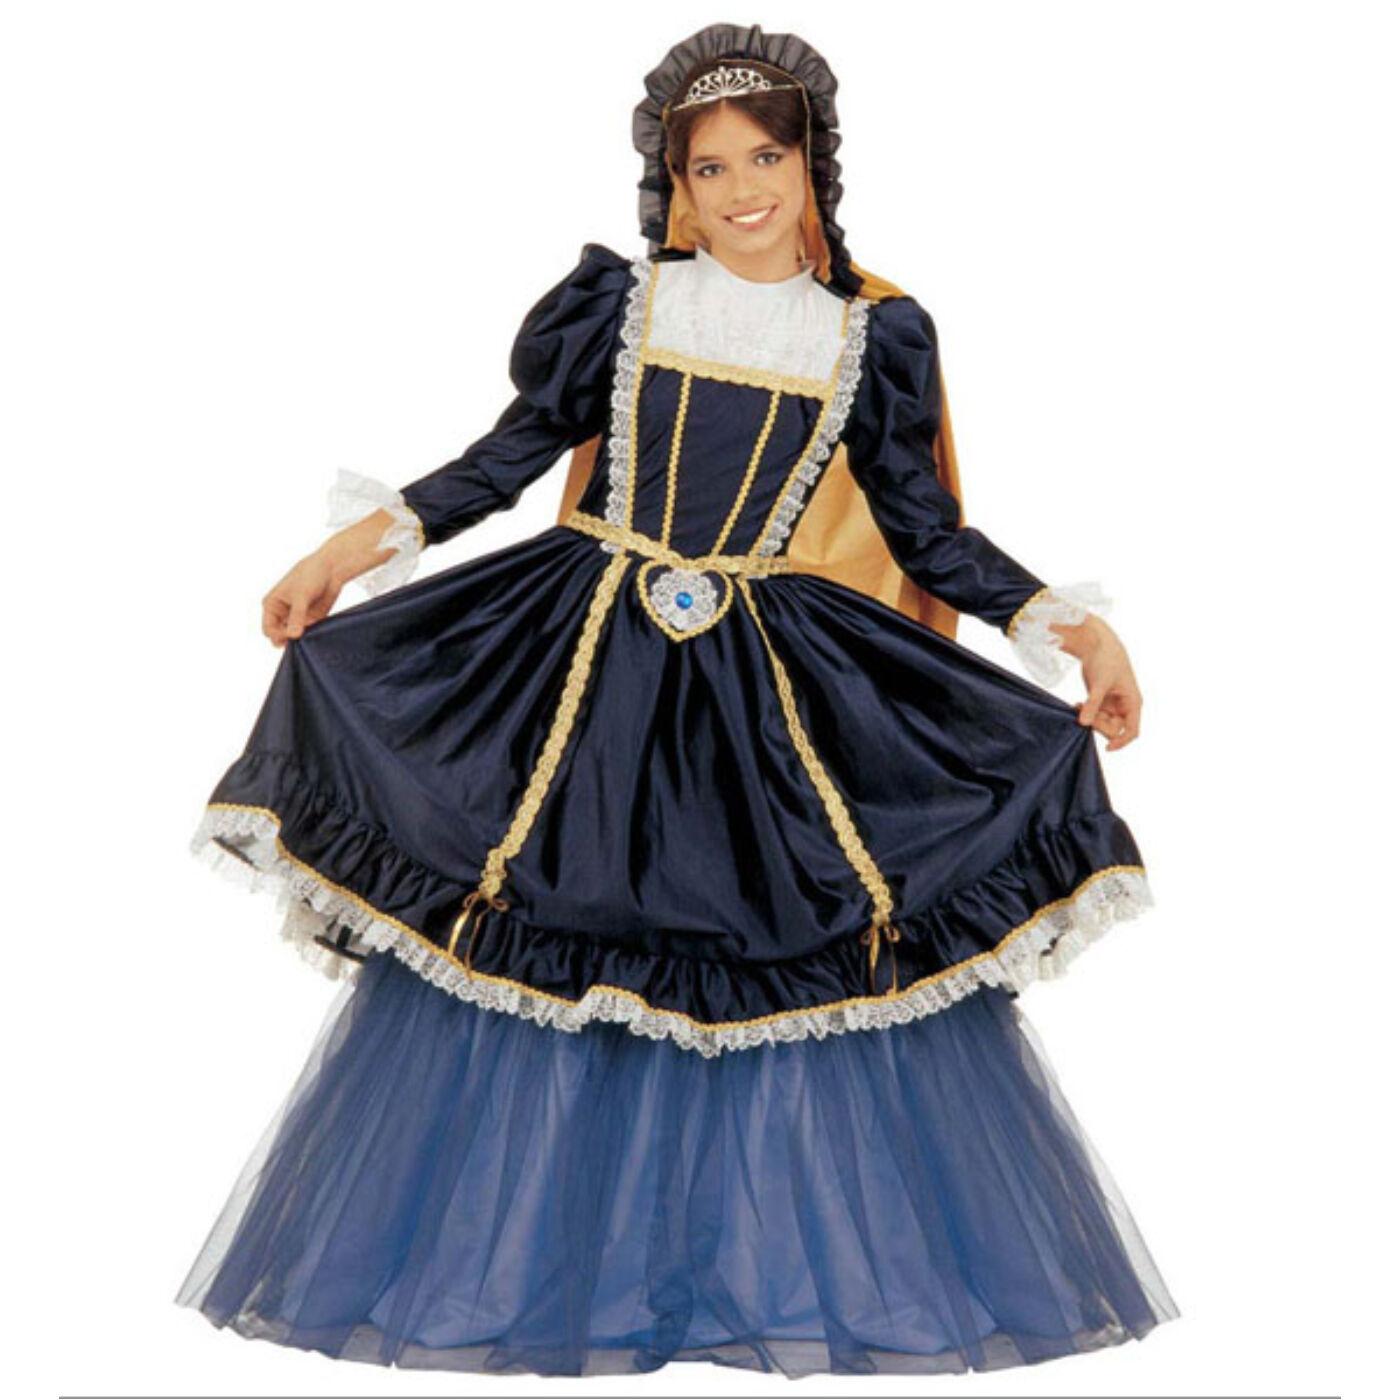 Court hercegnő Jelmez 128-as